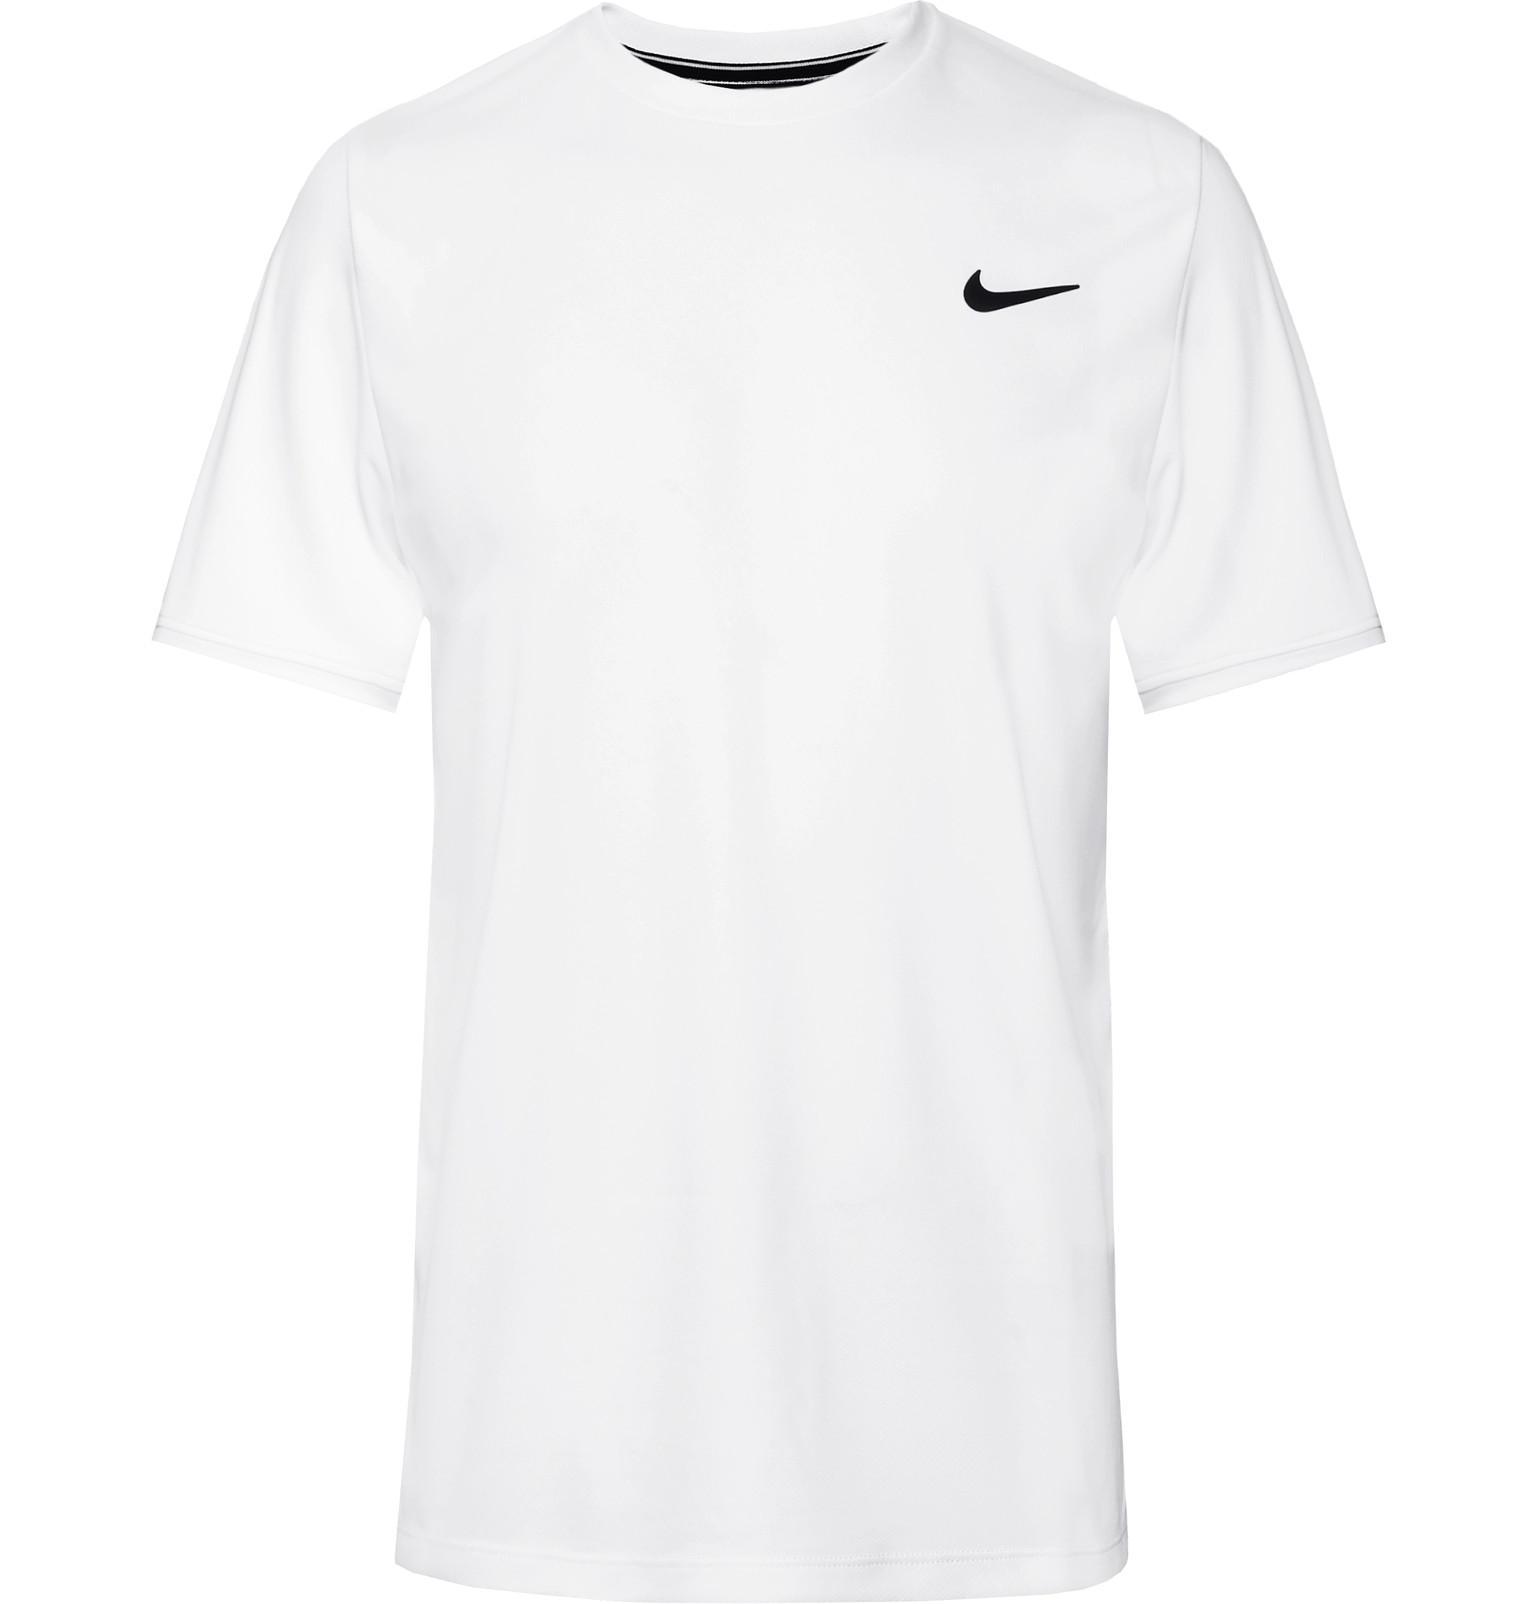 80dfd5da1 Lyst - Nike Nikecourt Dri-fit Tennis T-shirt in White for Men